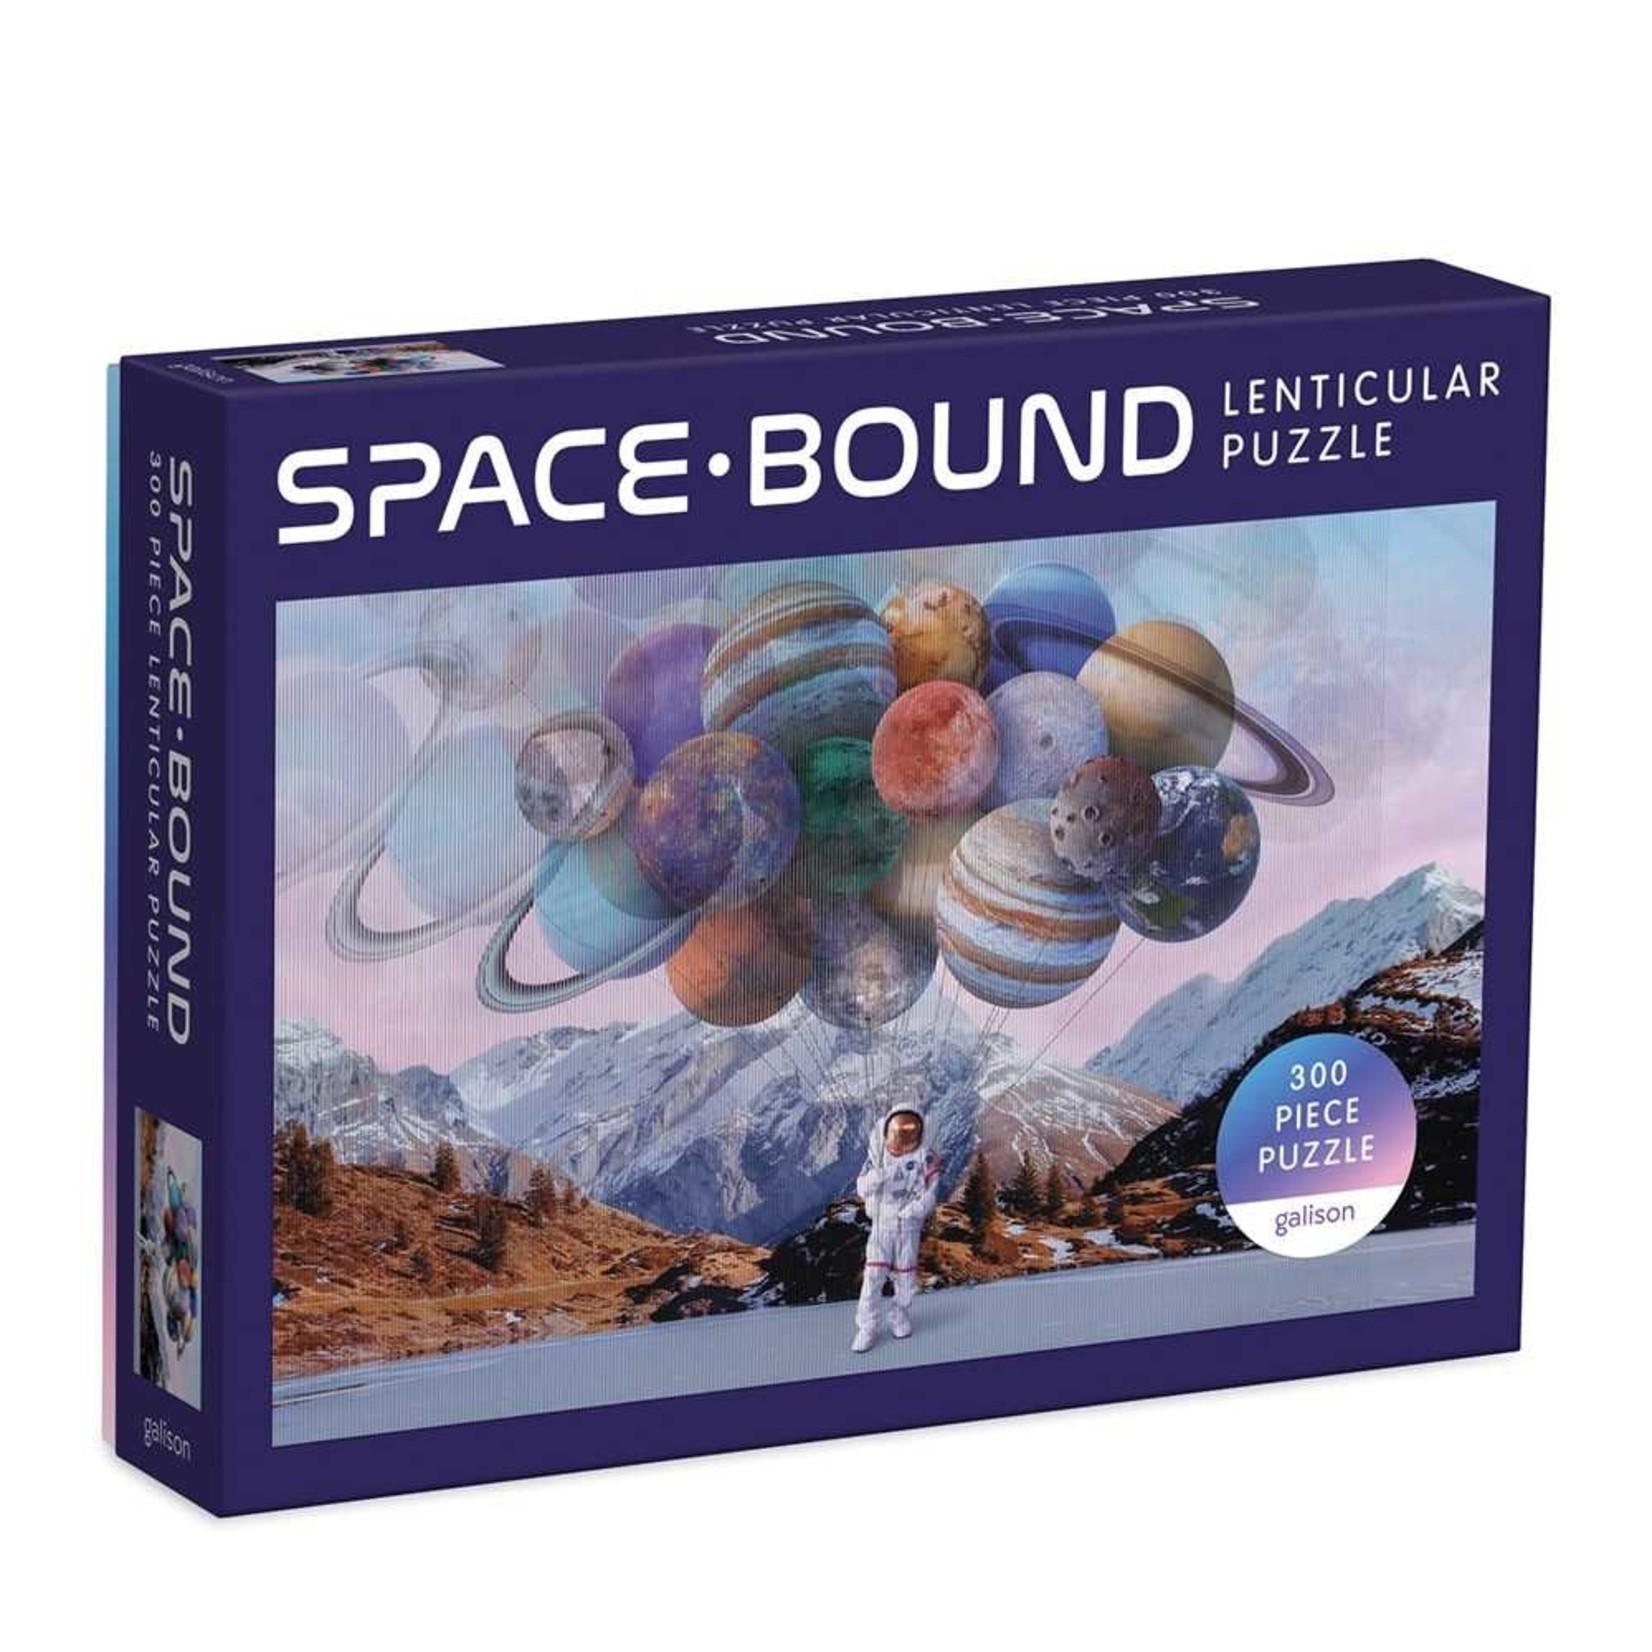 Galison Space Bound Lenticular 300pc